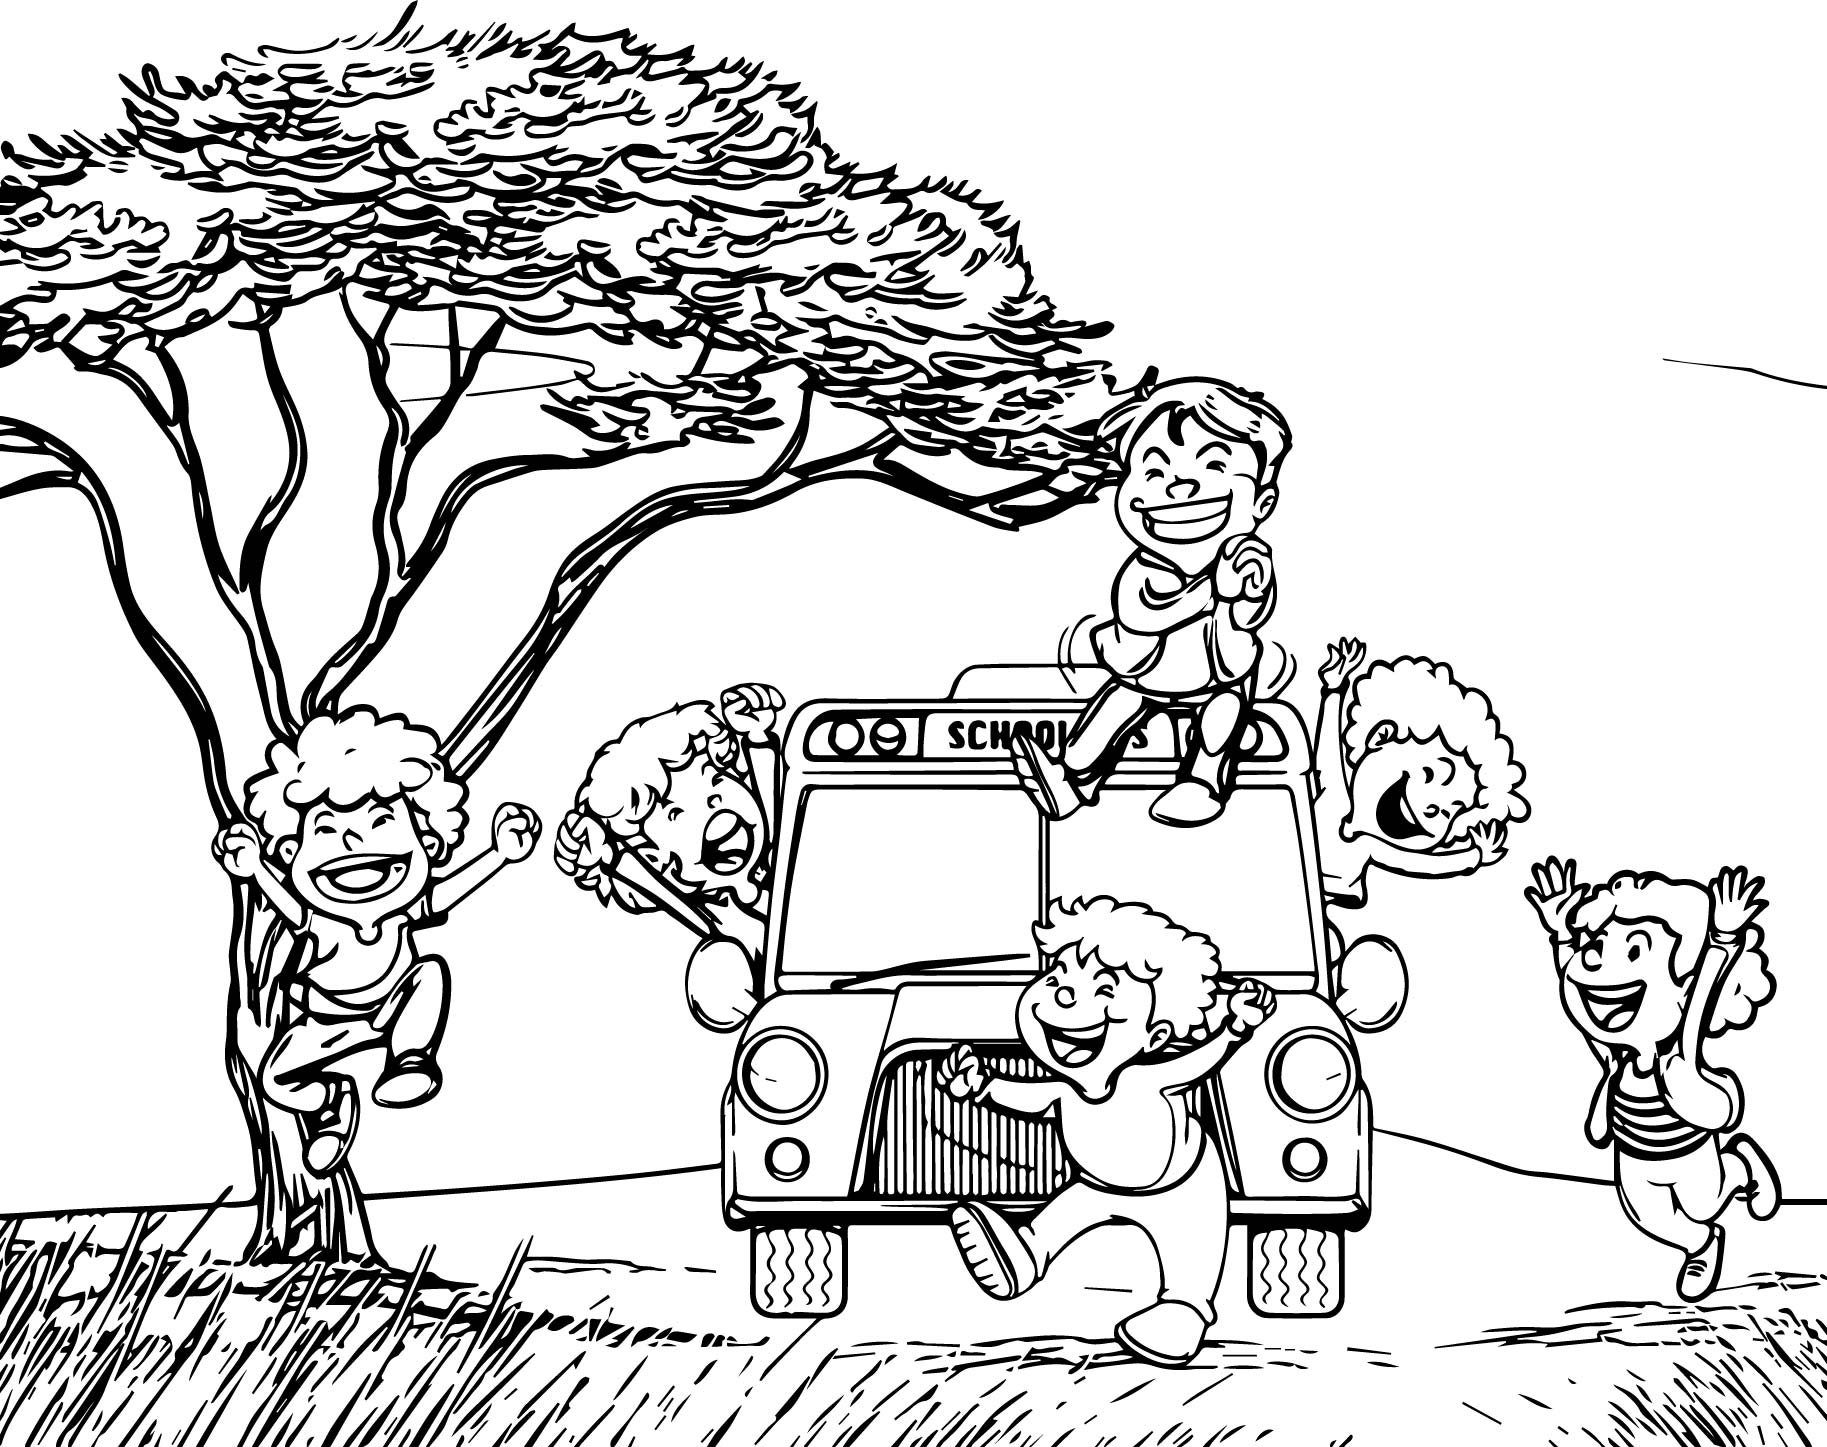 Crazy Child School Bus Coloring Page | Wecoloringpage.com